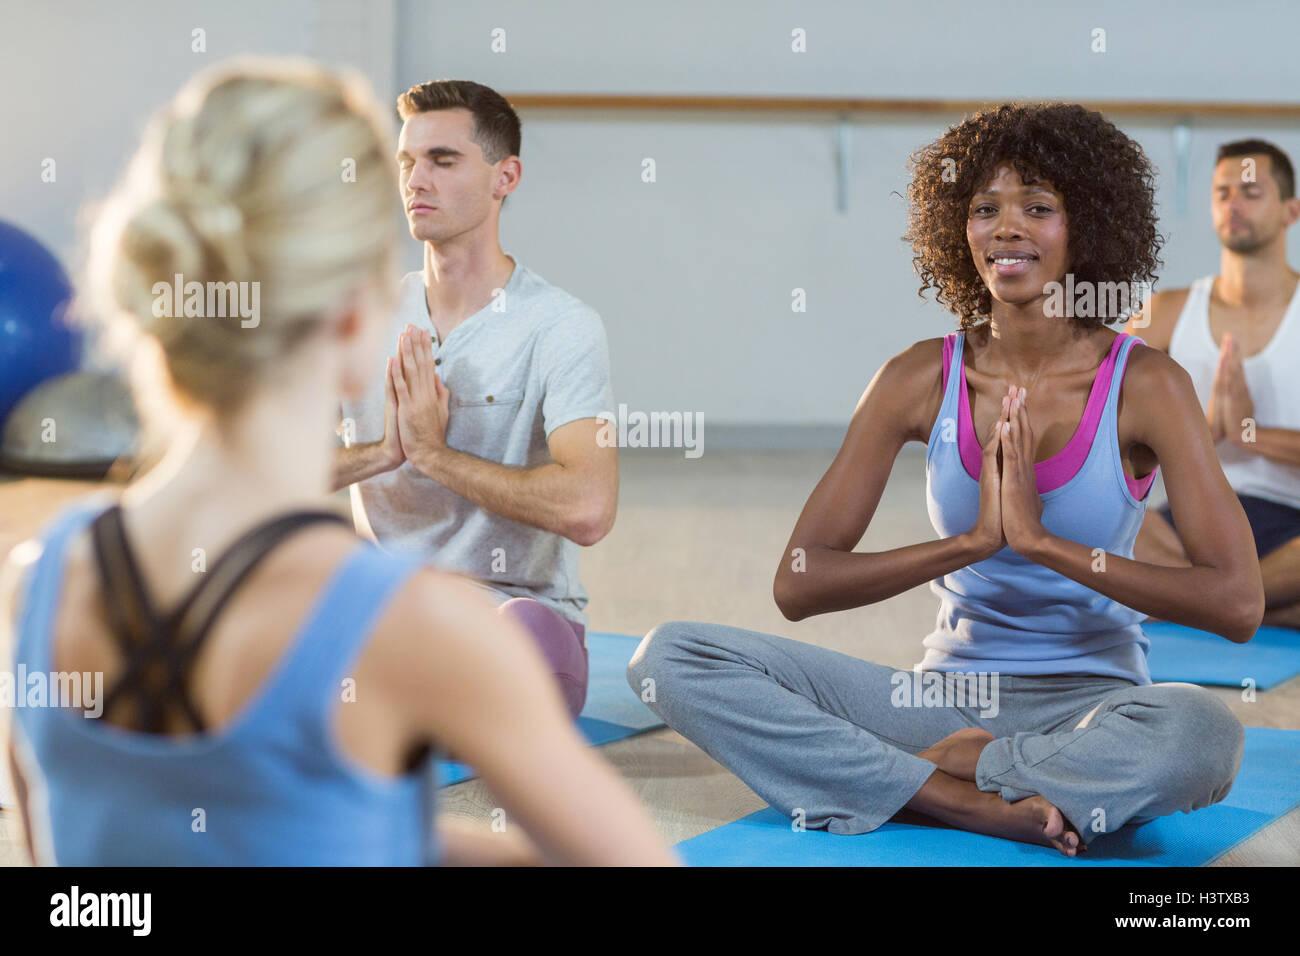 Tomar clases de yoga instructor Imagen De Stock